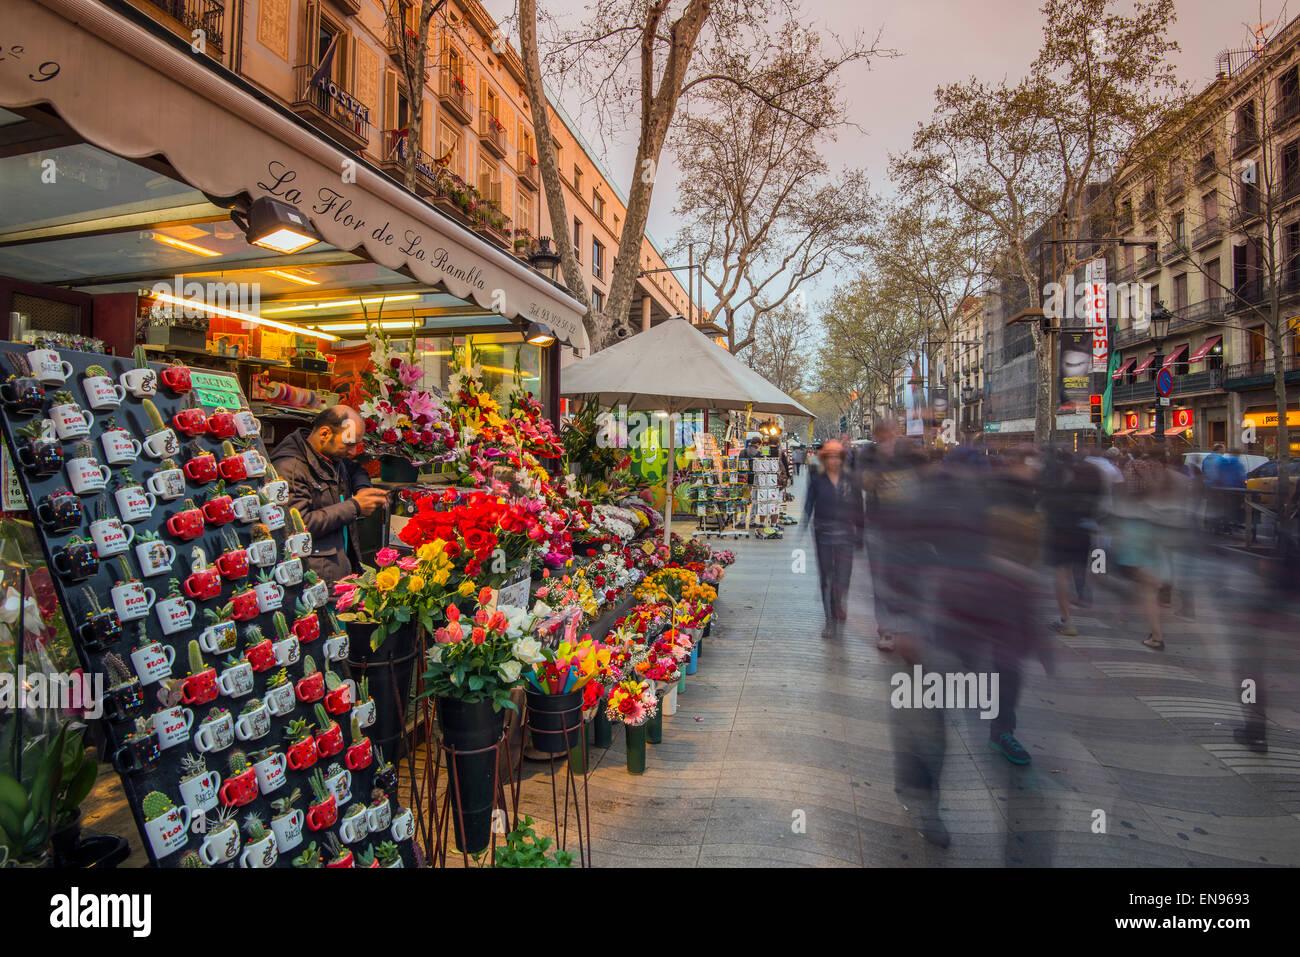 Blumengeschäft Kiosk auf der La Rambla, Barcelona, Katalonien, Spanien Stockbild